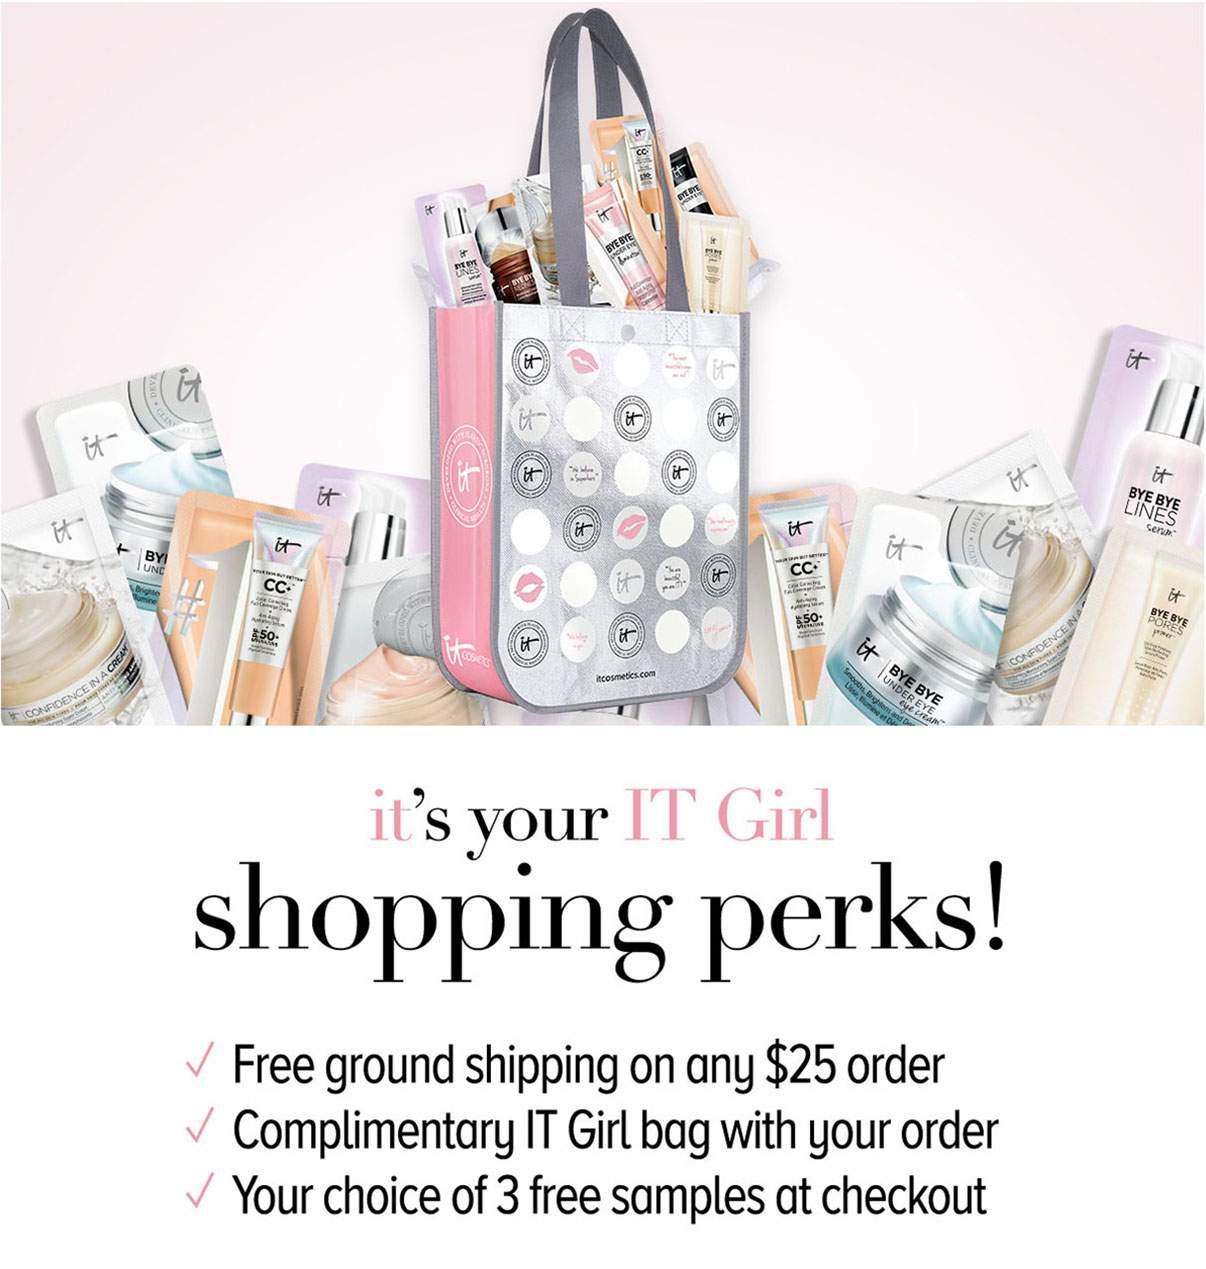 000003_Offer_Op_Shopping_Perks1